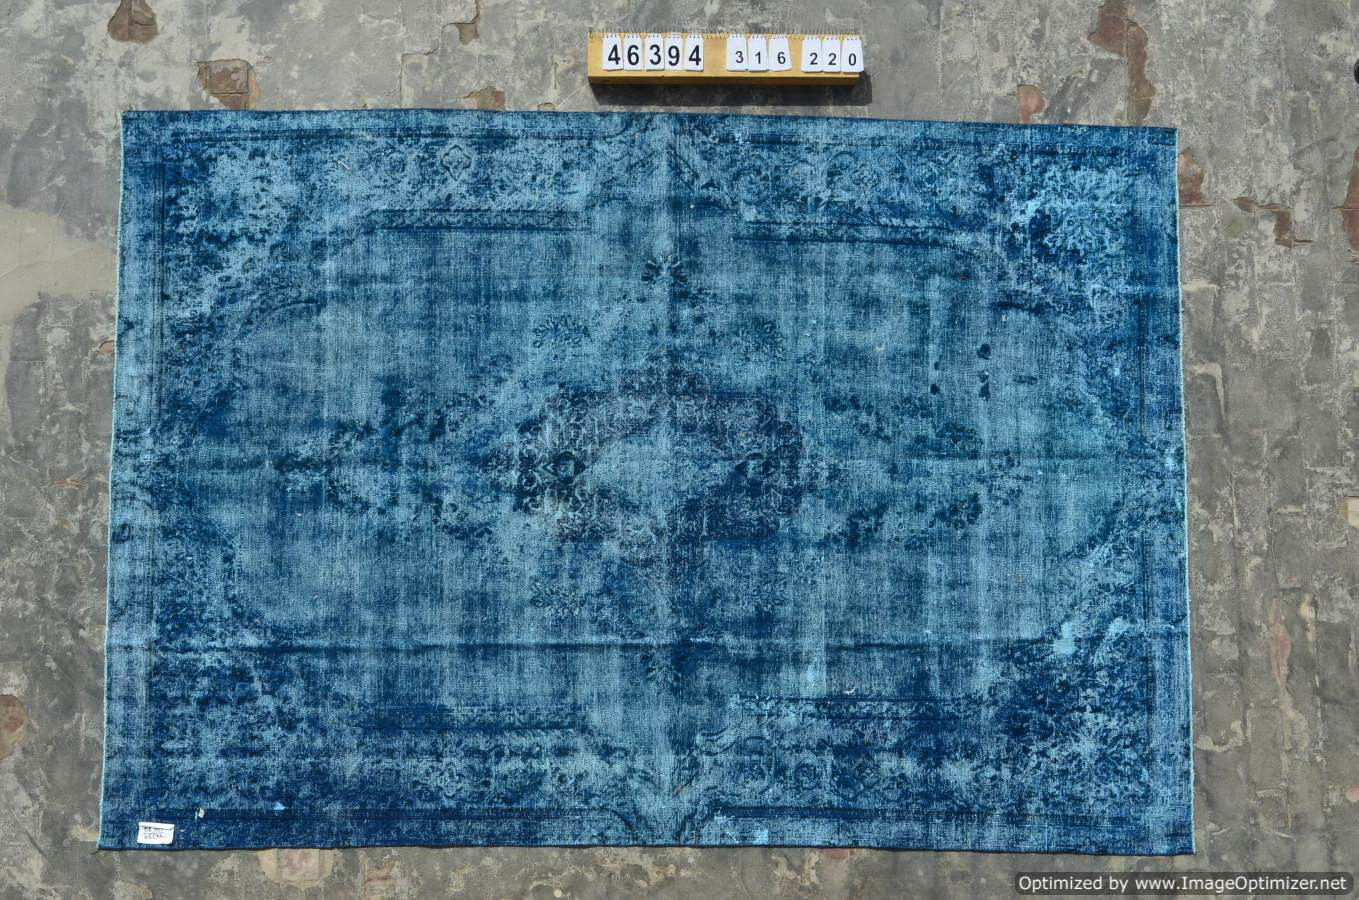 Blauw vintage vloerkleed nr 46394 ( 316cm x 220cm) Nieuw ingekocht, vanaf 10 April op voorraad!